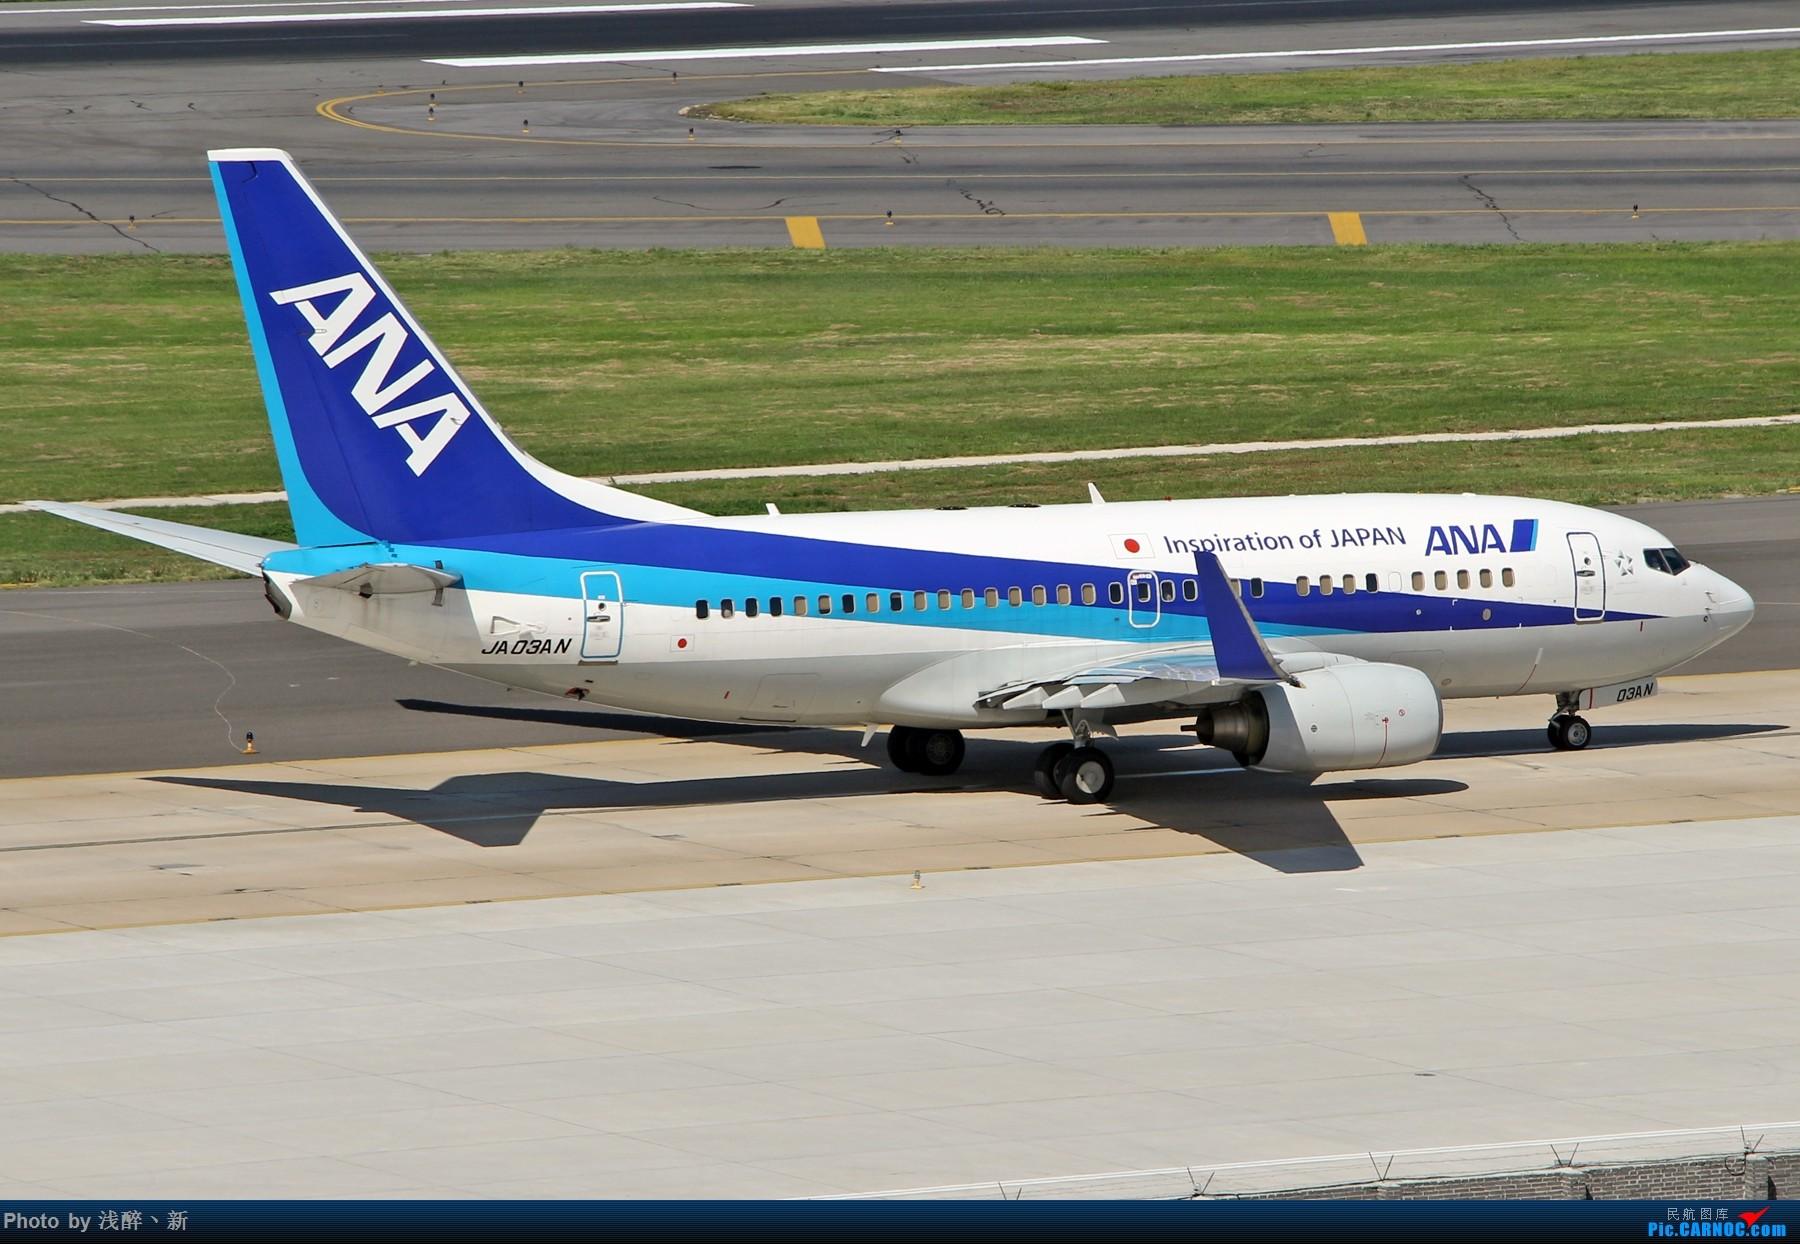 Re:[原创]DLC 8.26 日常[补] BOEING 737-700 JA03AN 中国大连国际机场